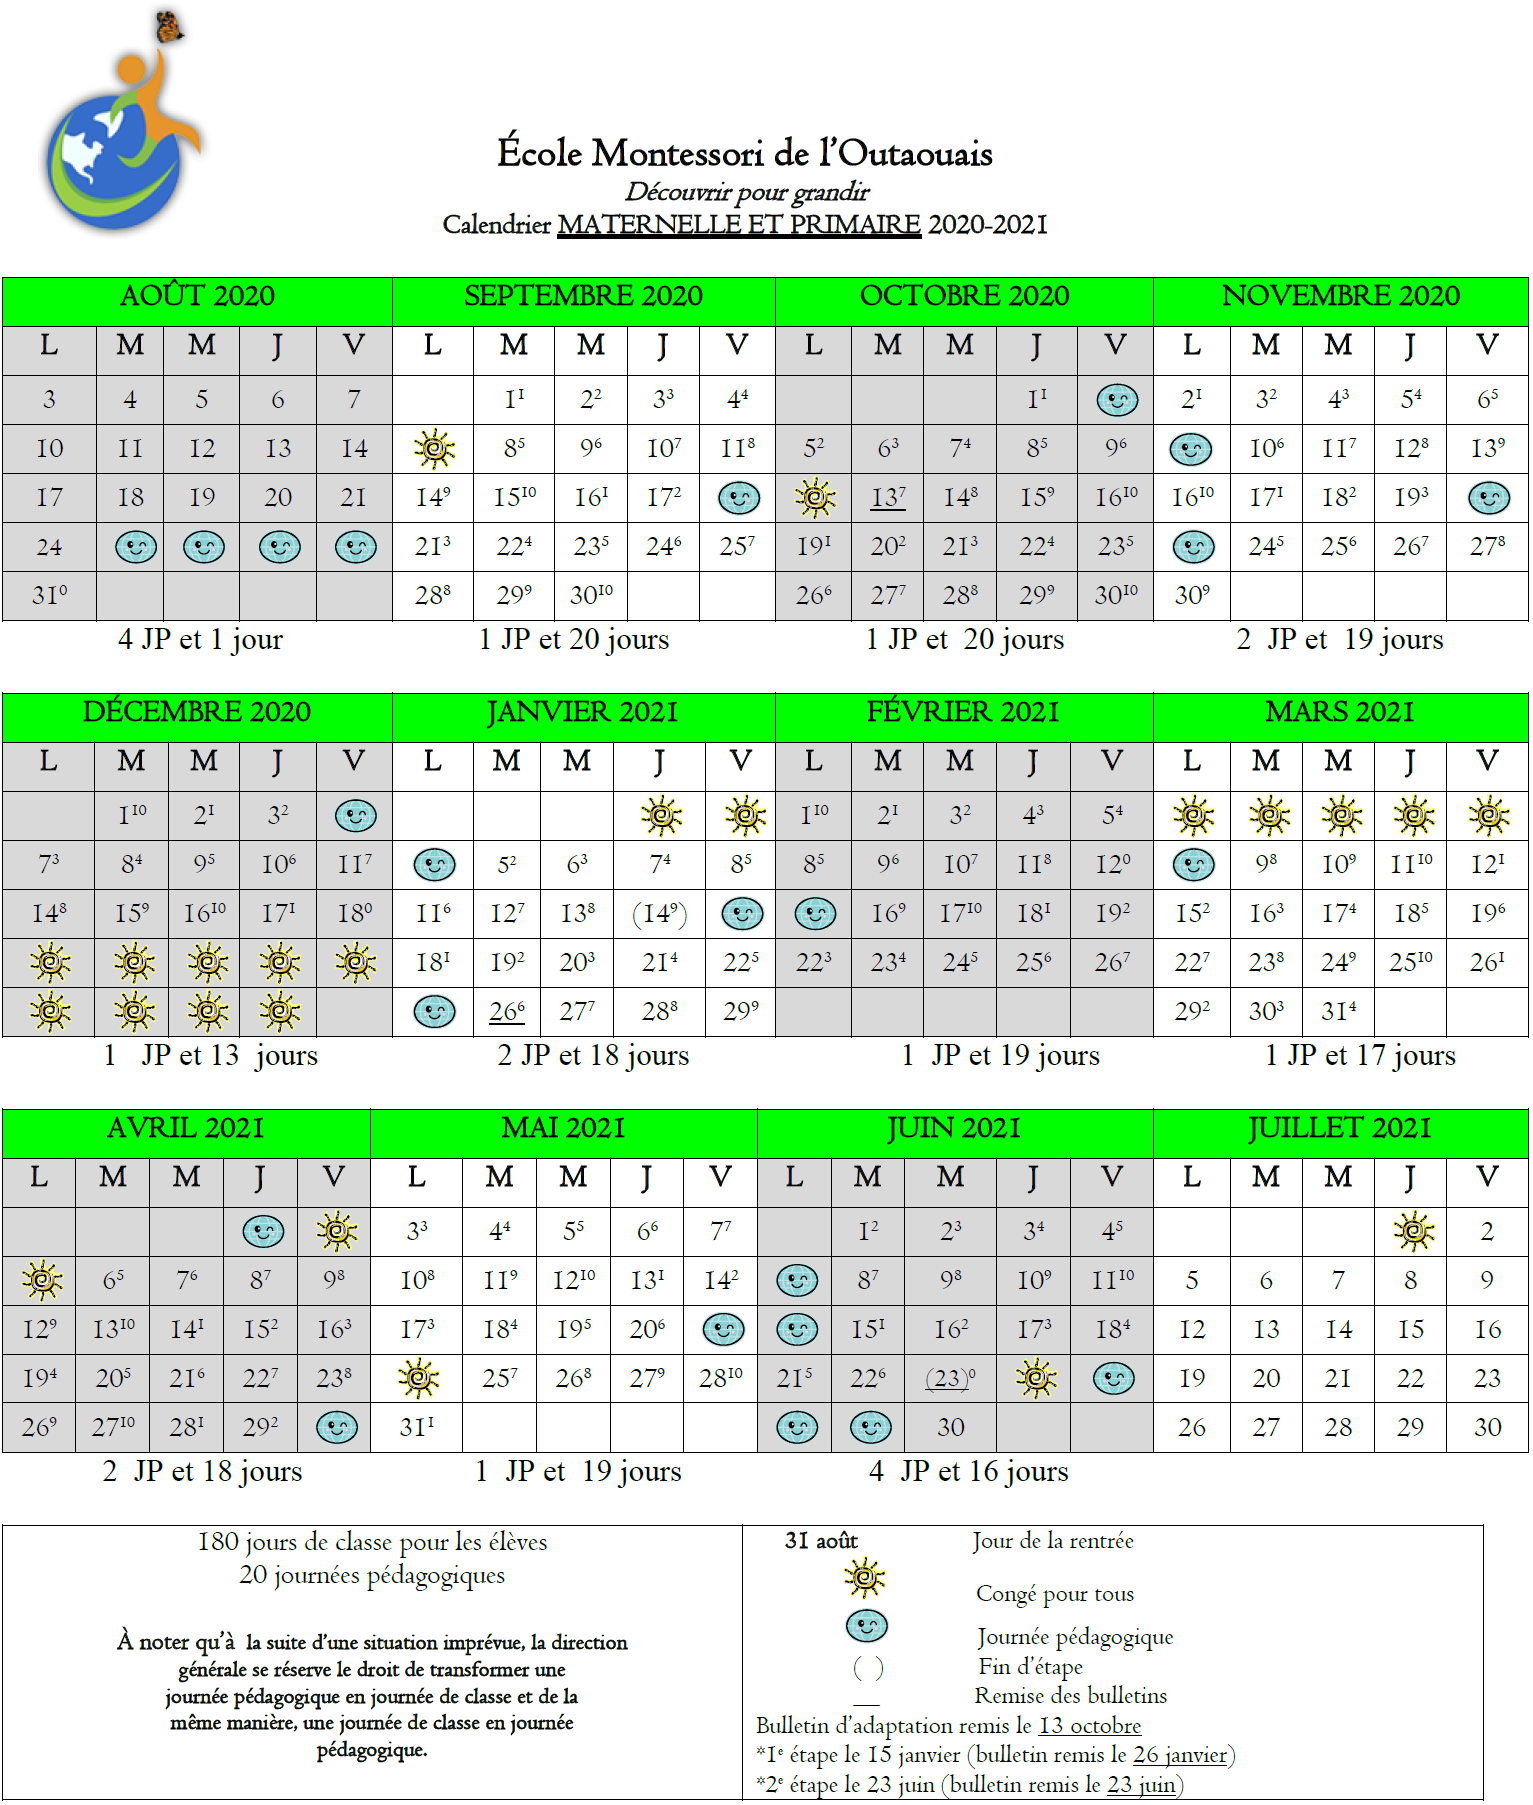 Calendrier-scolaire-2020-2021-maternelle-et-primaire